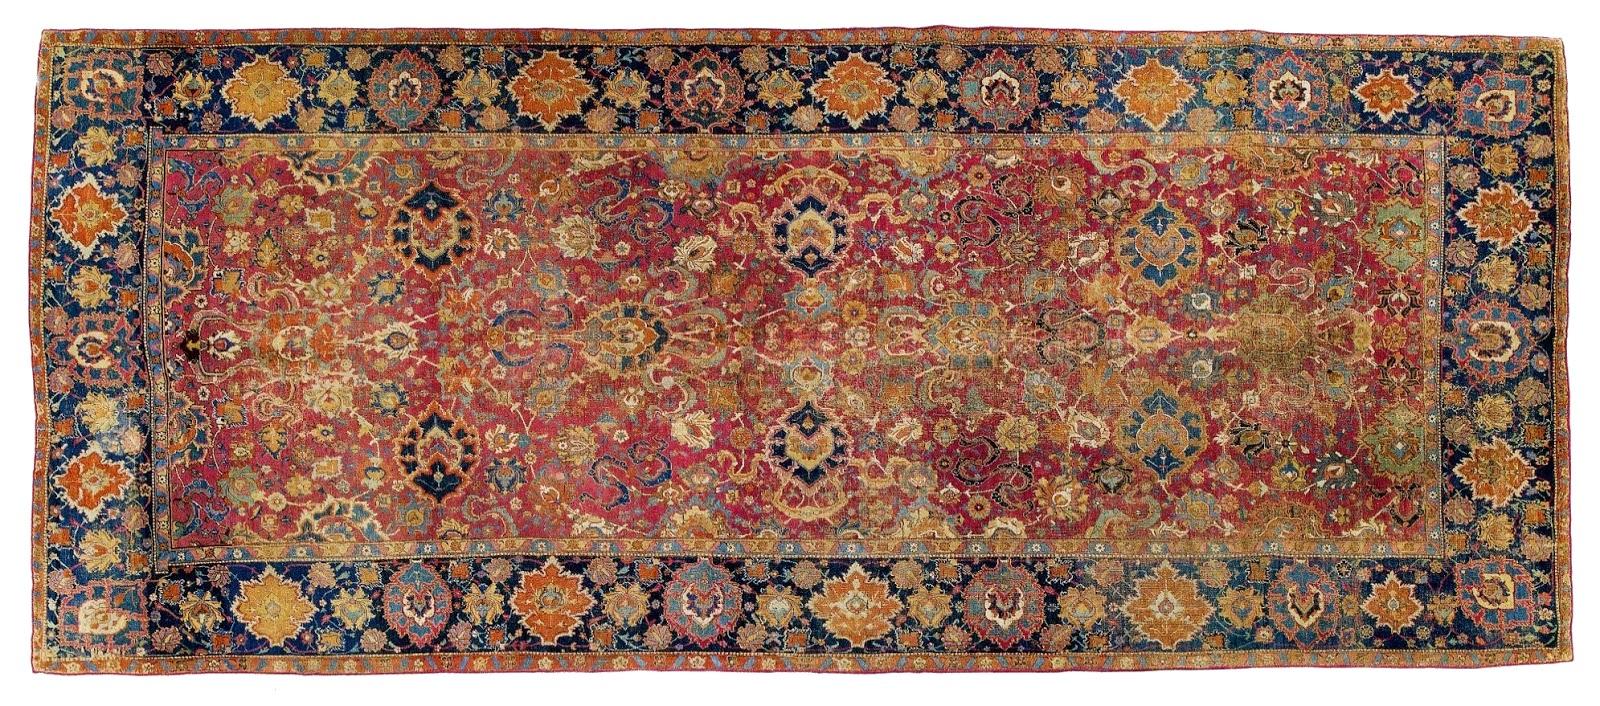 Rugtracker Lineage Ii Iran 17th Century